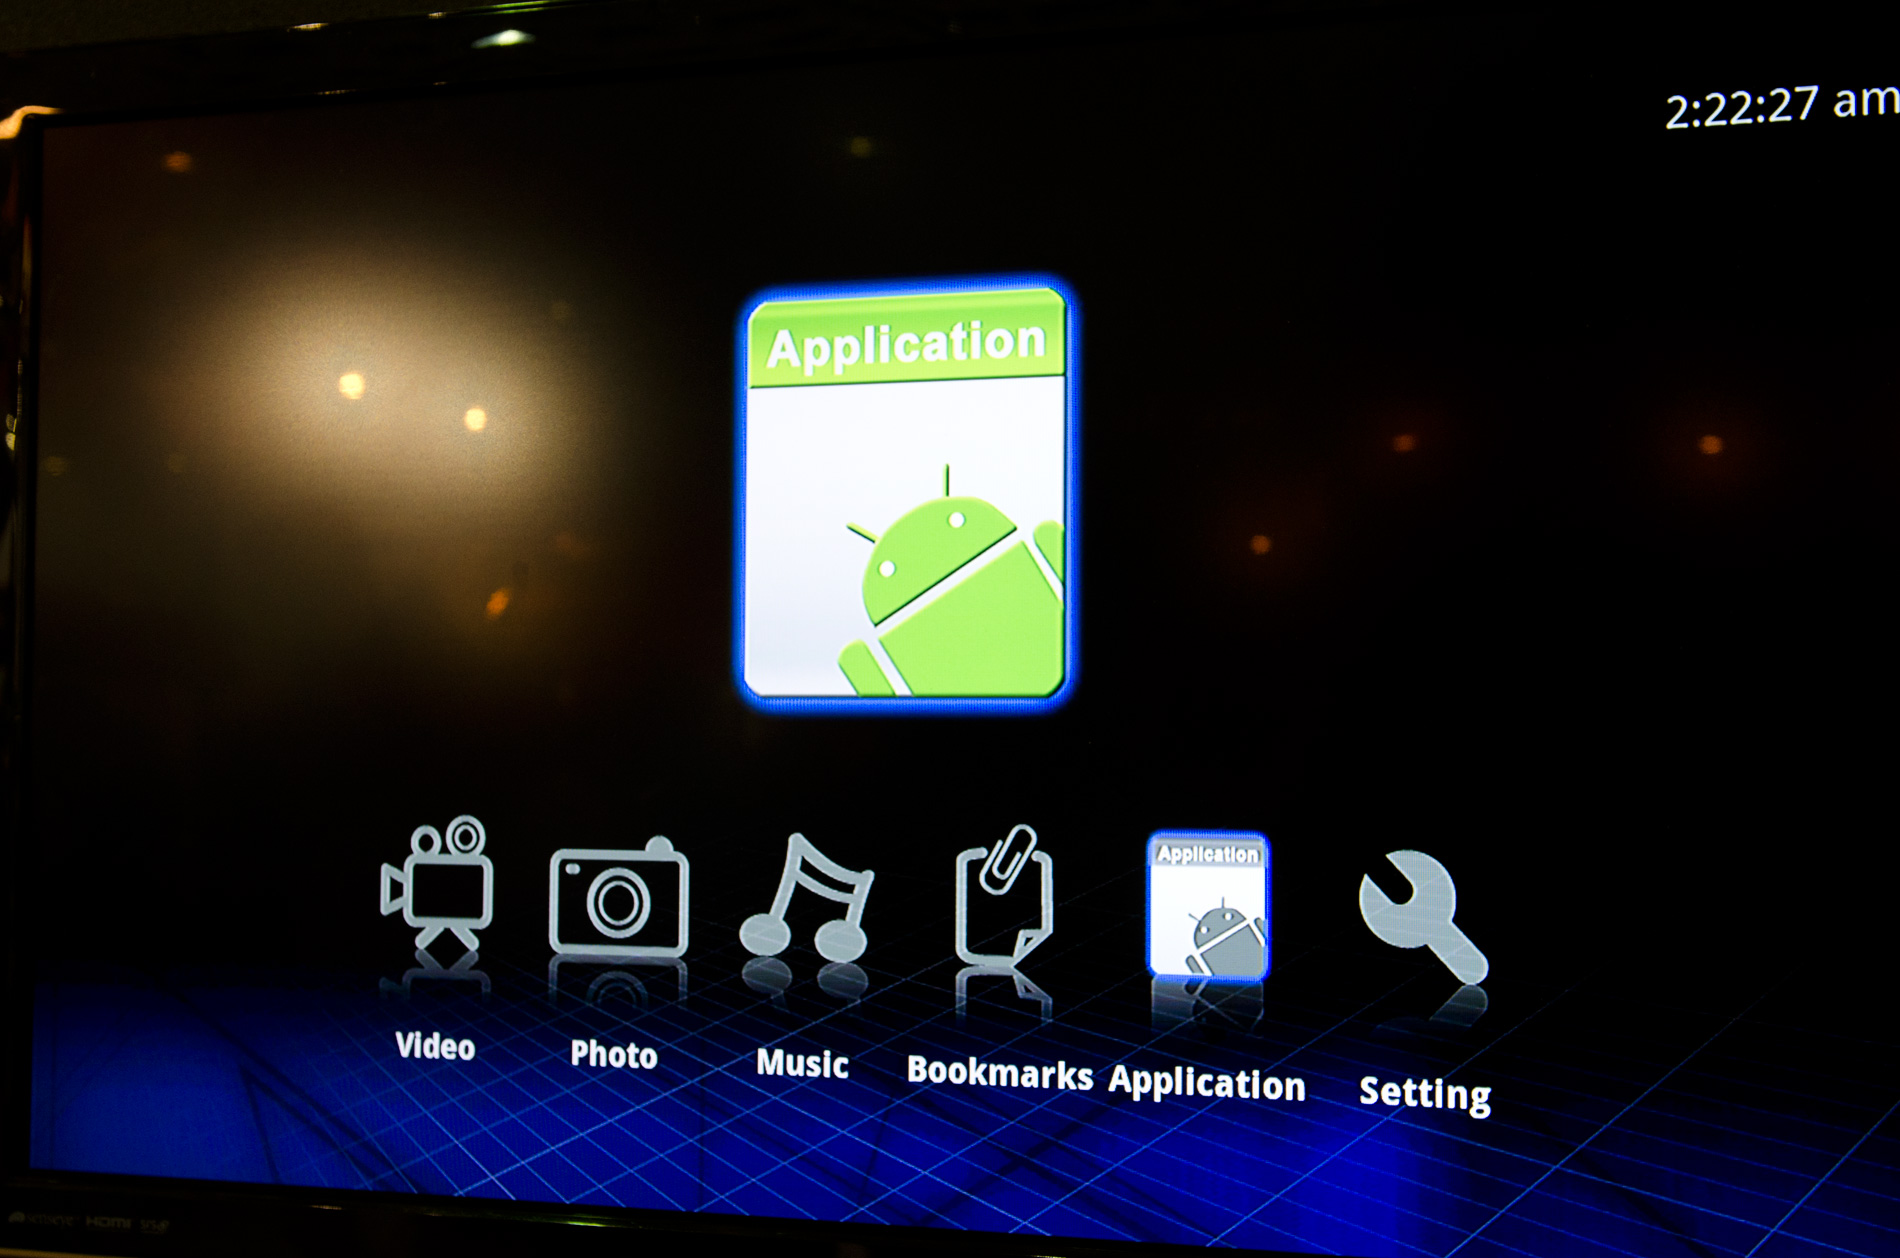 Patriot Box Office Alpine: Android Based Media Streamer